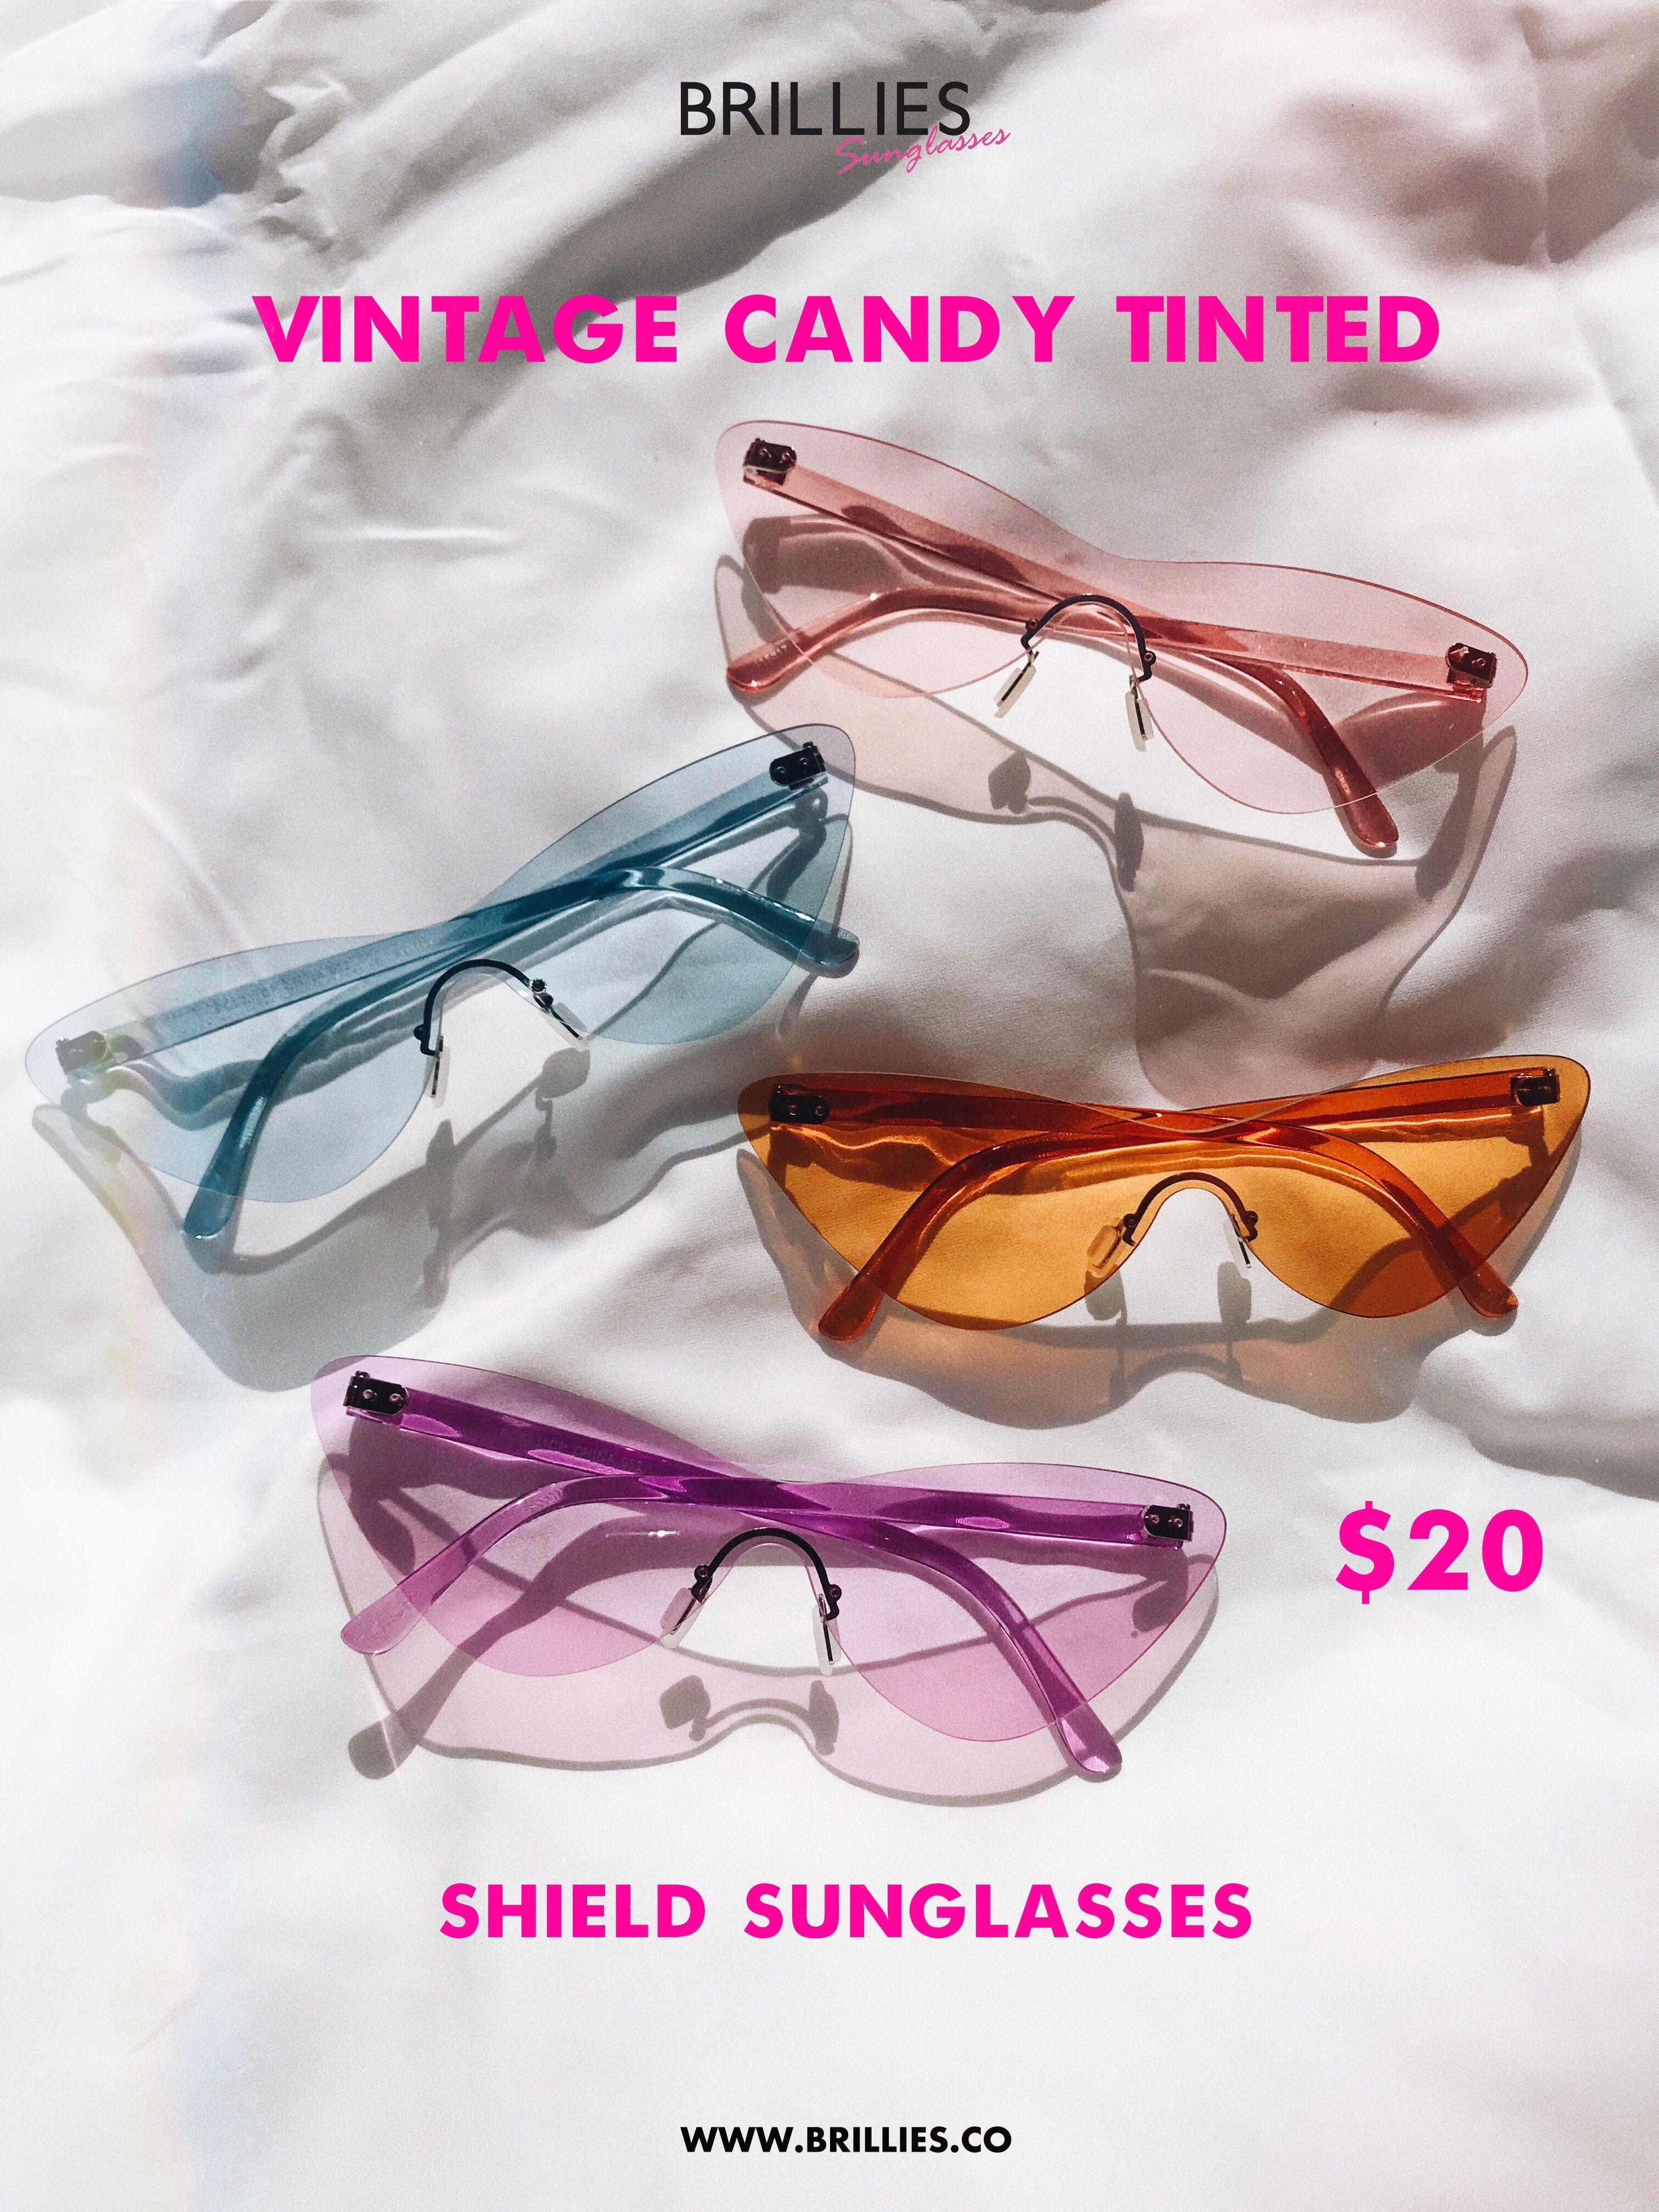 82ef7f7017b Pin by Brillies Sunglasses on Brillies Sunglasses